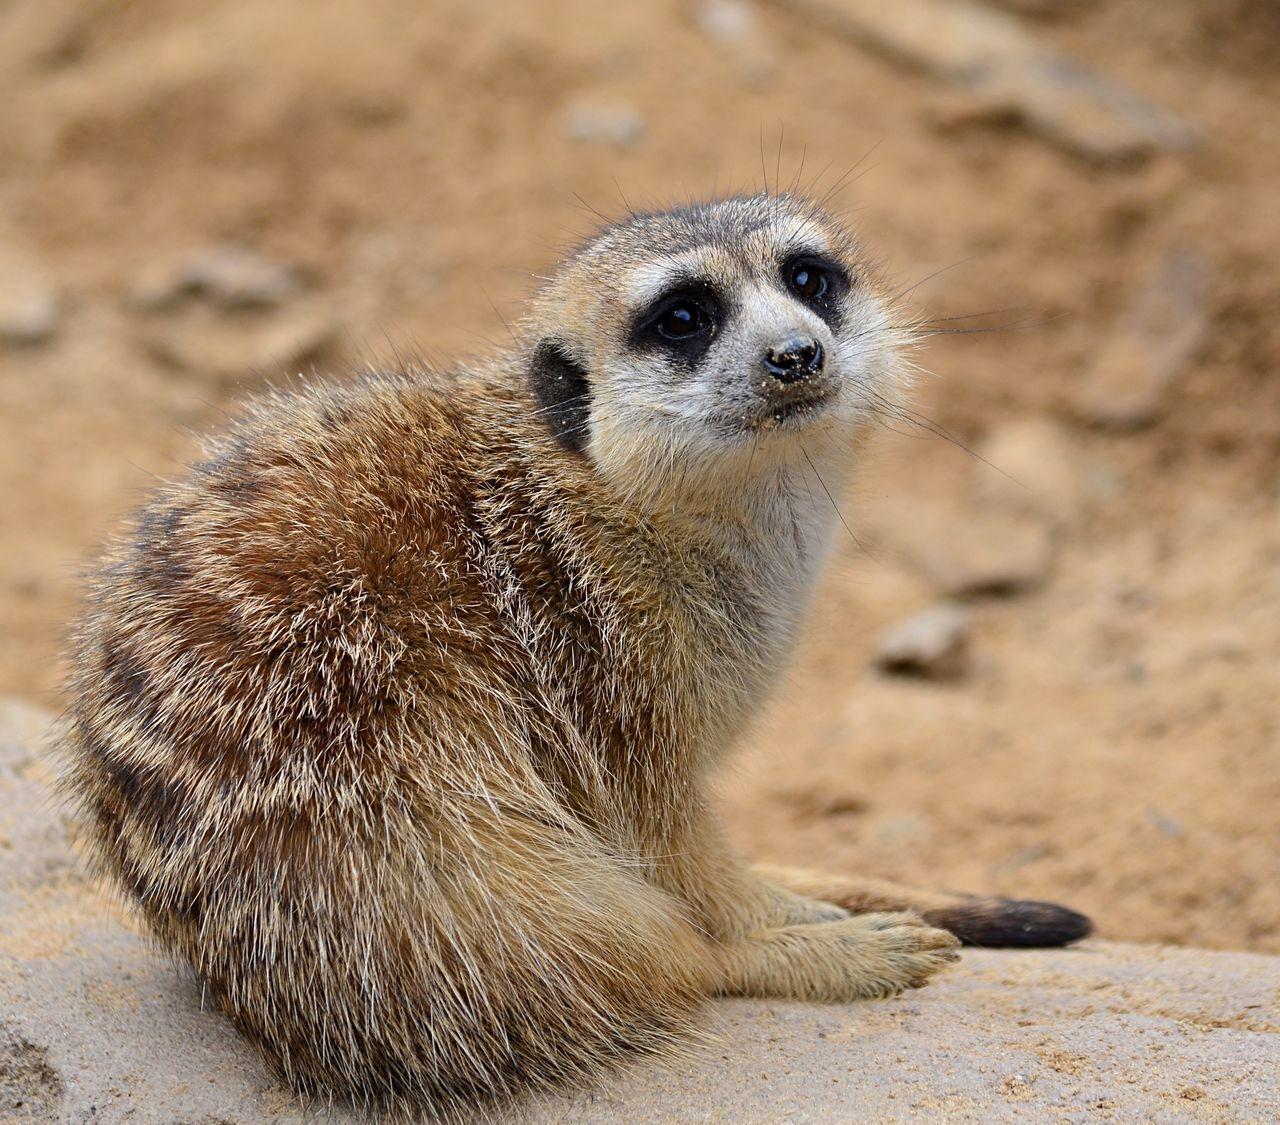 Meerkat sitting Animal Themes Close-up Day Mammal Meerkat Nature No People One Animal Outdoors Pjpink